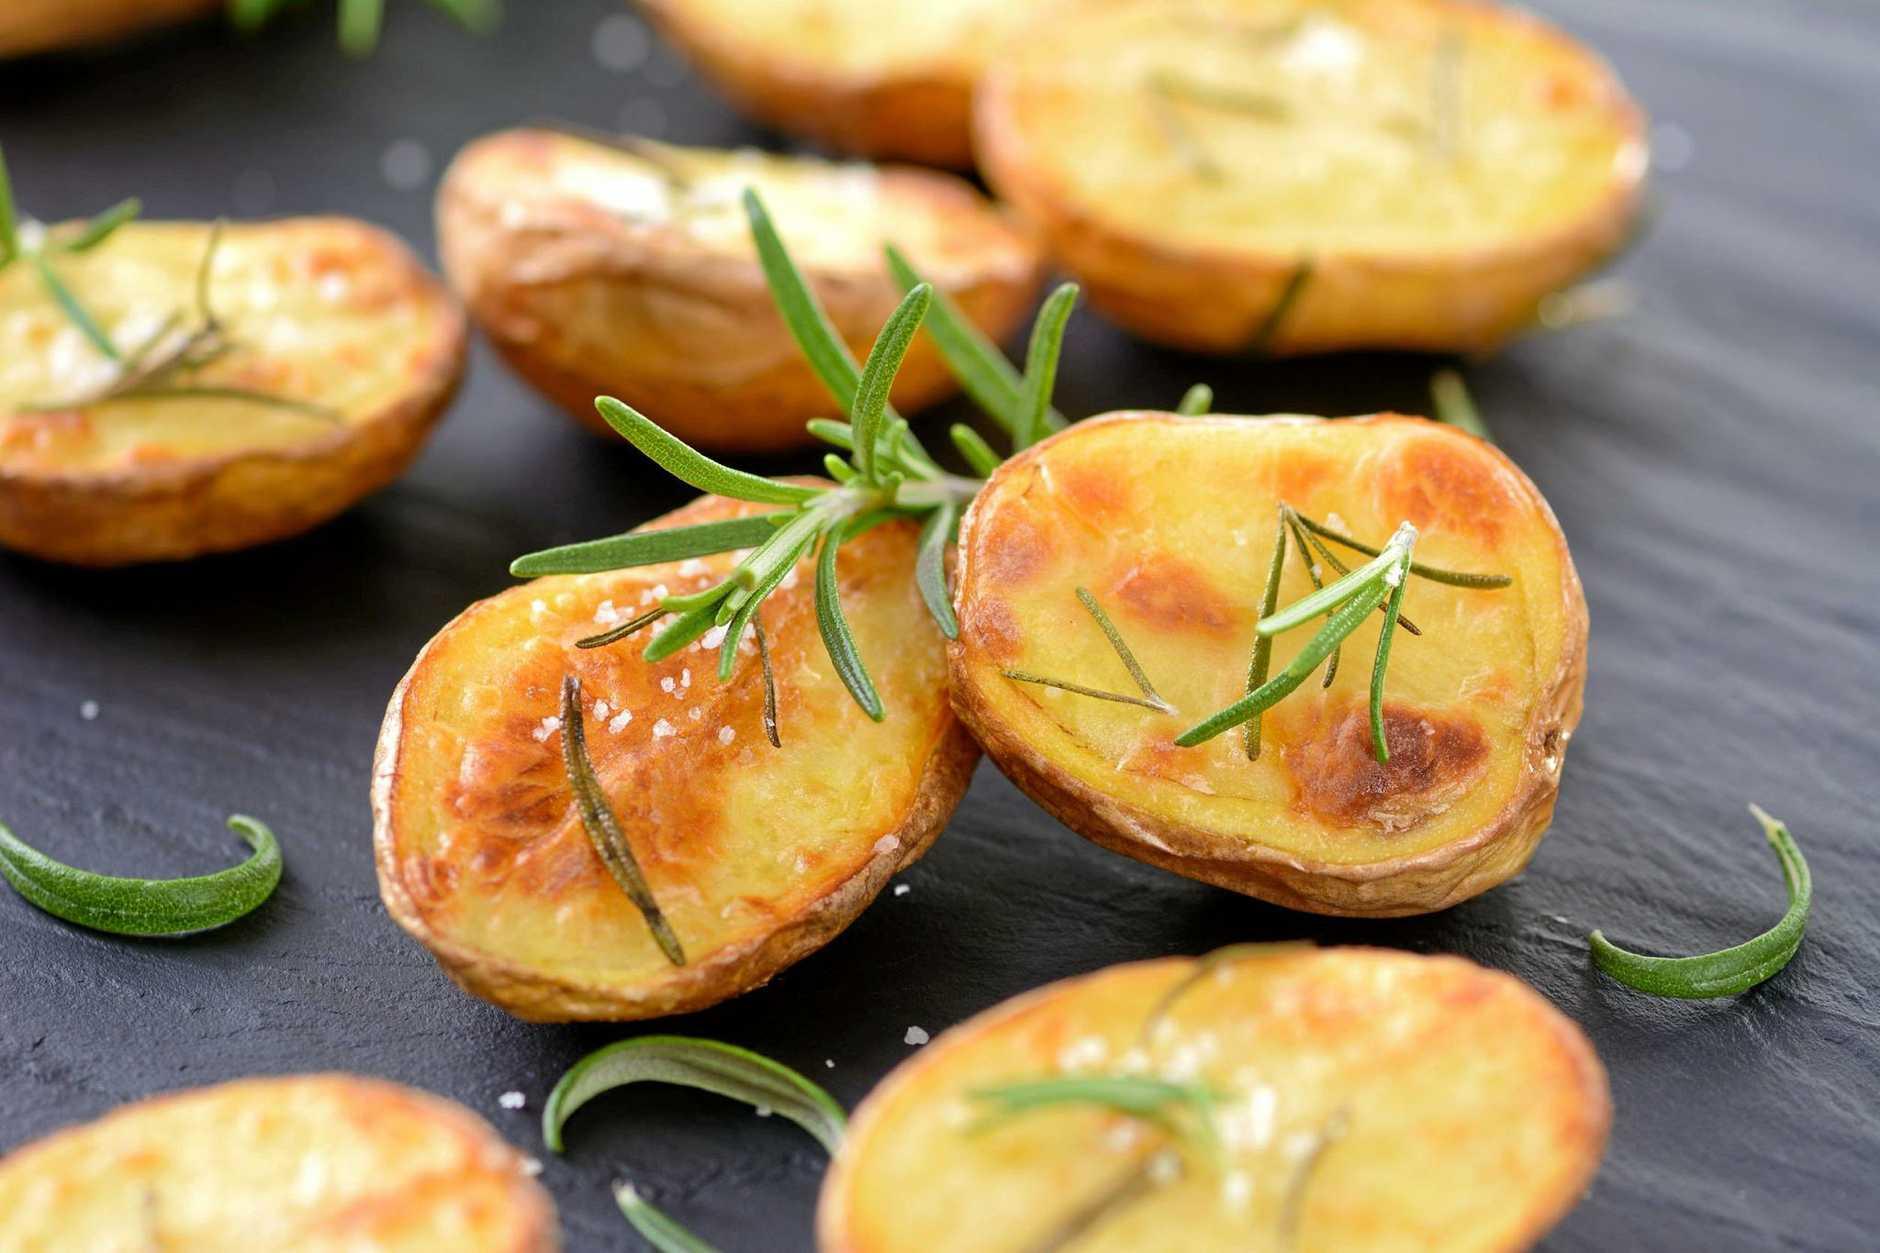 Make roast potatoes a healthier choice by following a few tips.